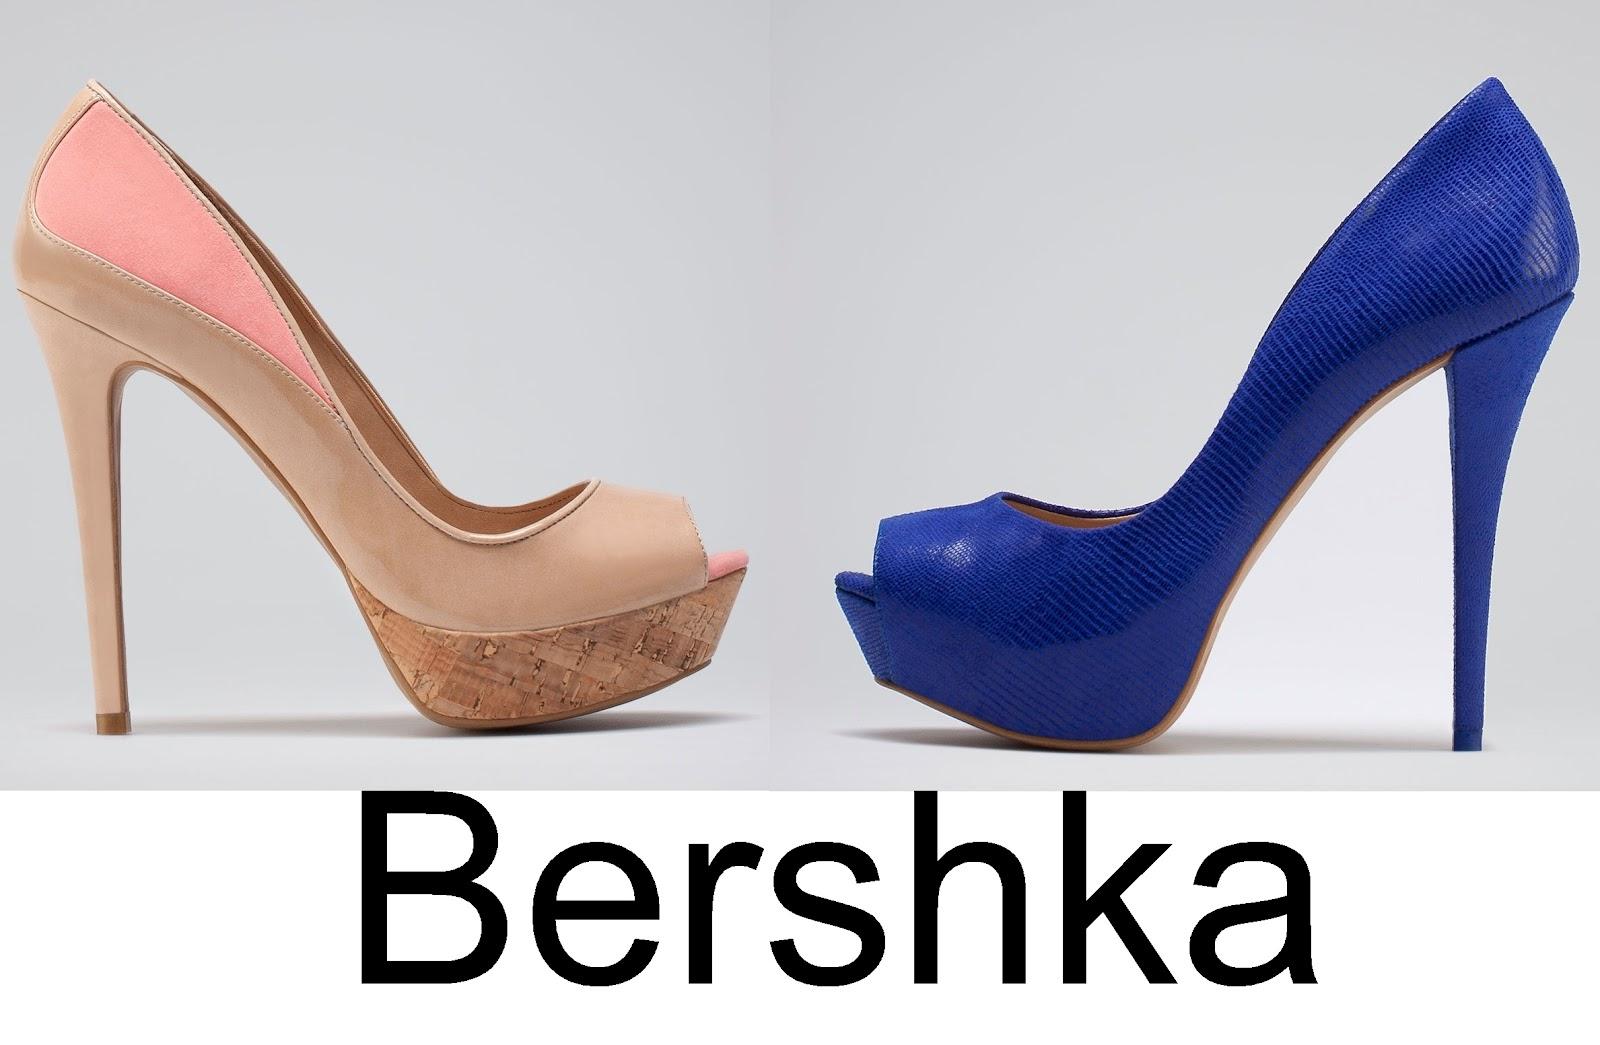 bc67ba8a1b11 Bershka  Νέες Αφίξεις Παπούτσια Άνοιξη Καλοκαίρι 2012